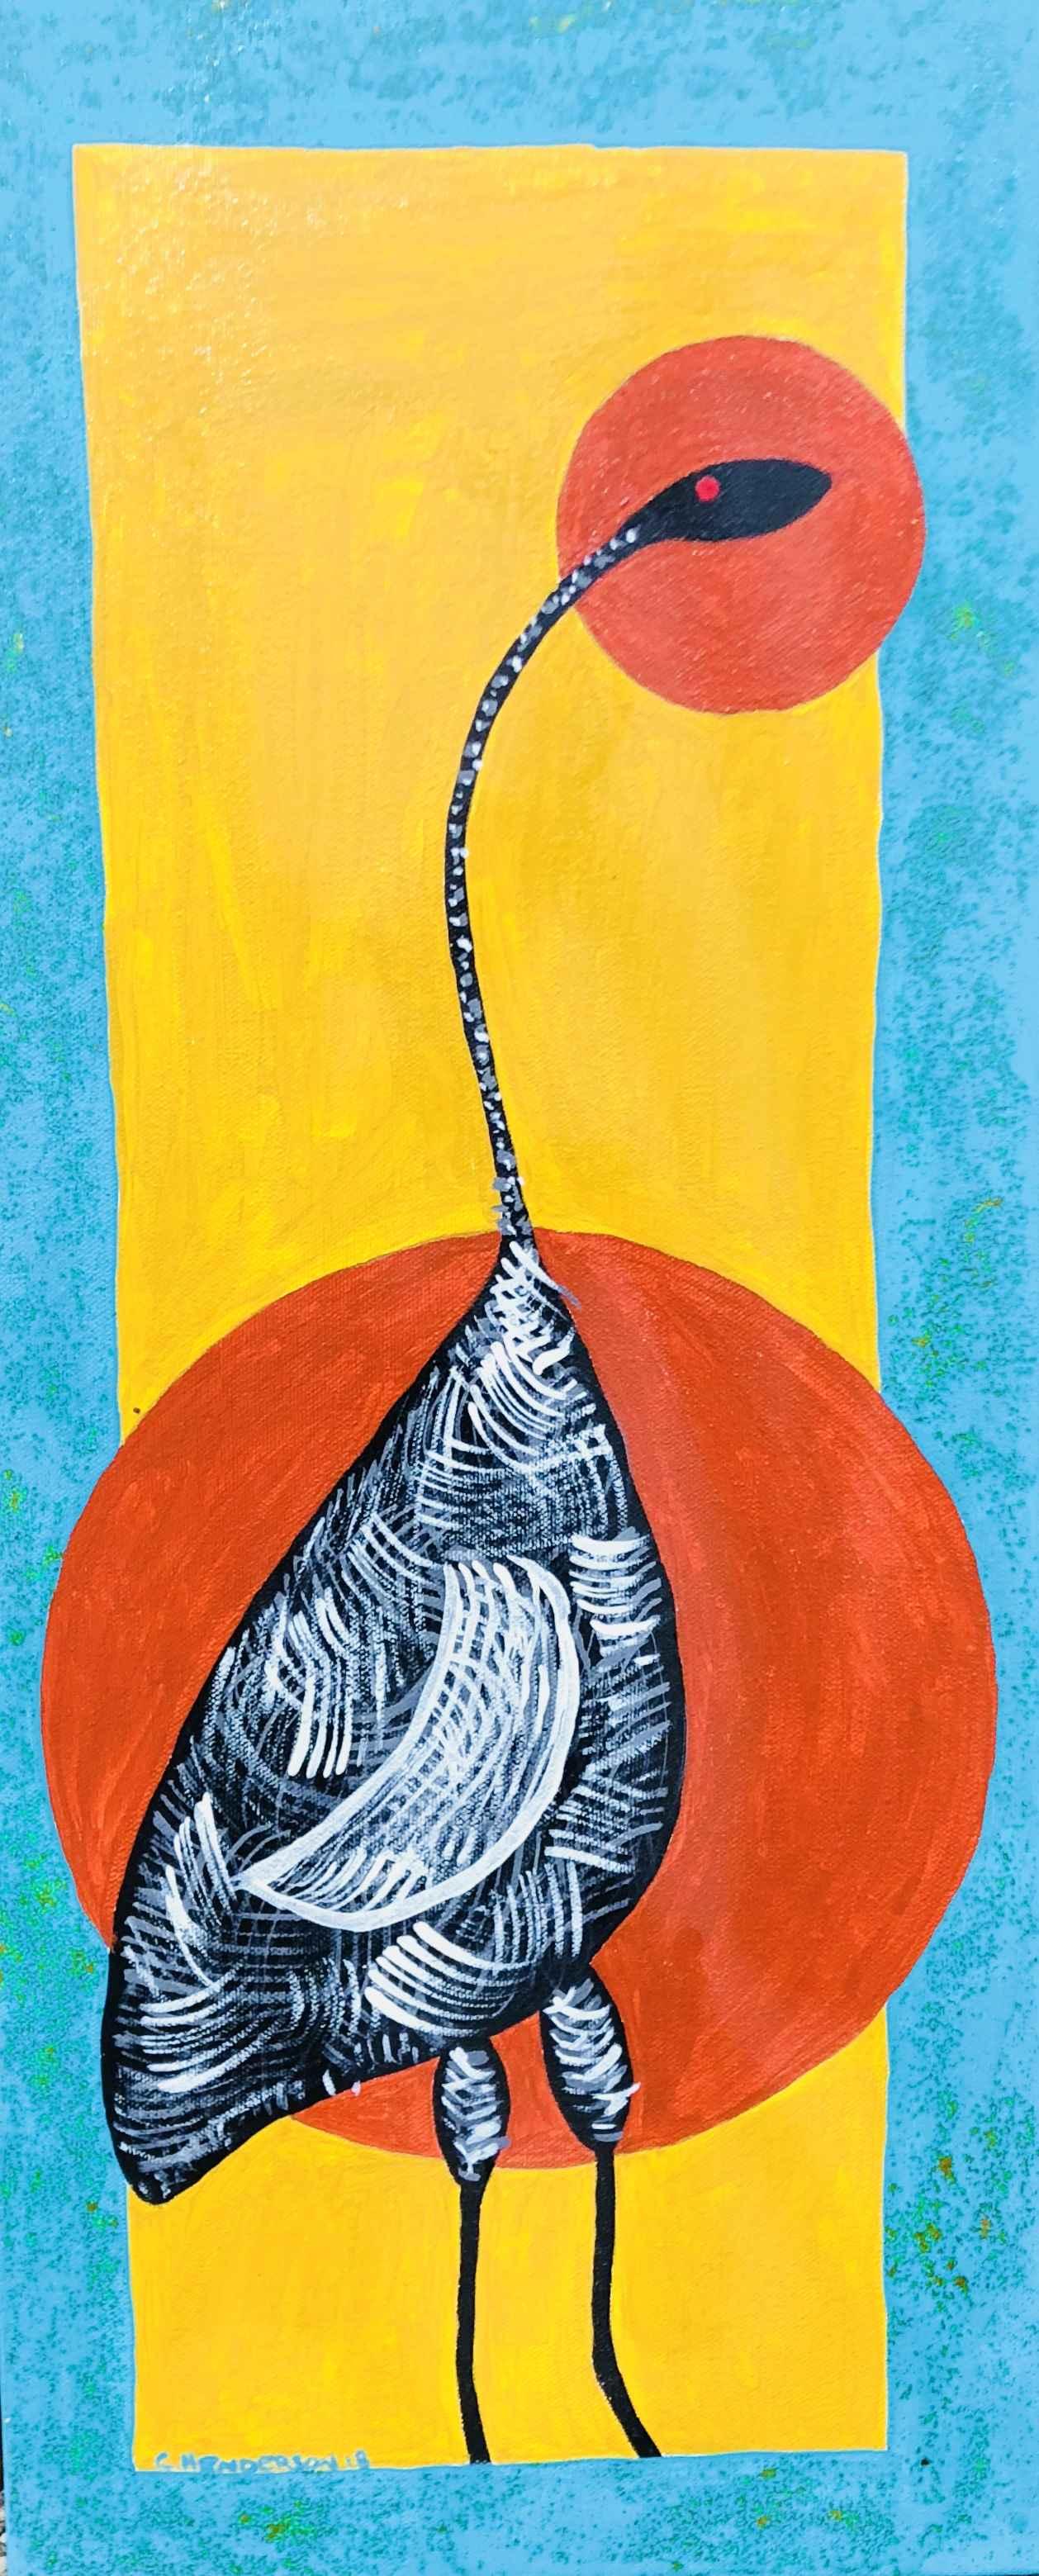 Brolga in Sunset by  Clive EHenderson - Masterpiece Online